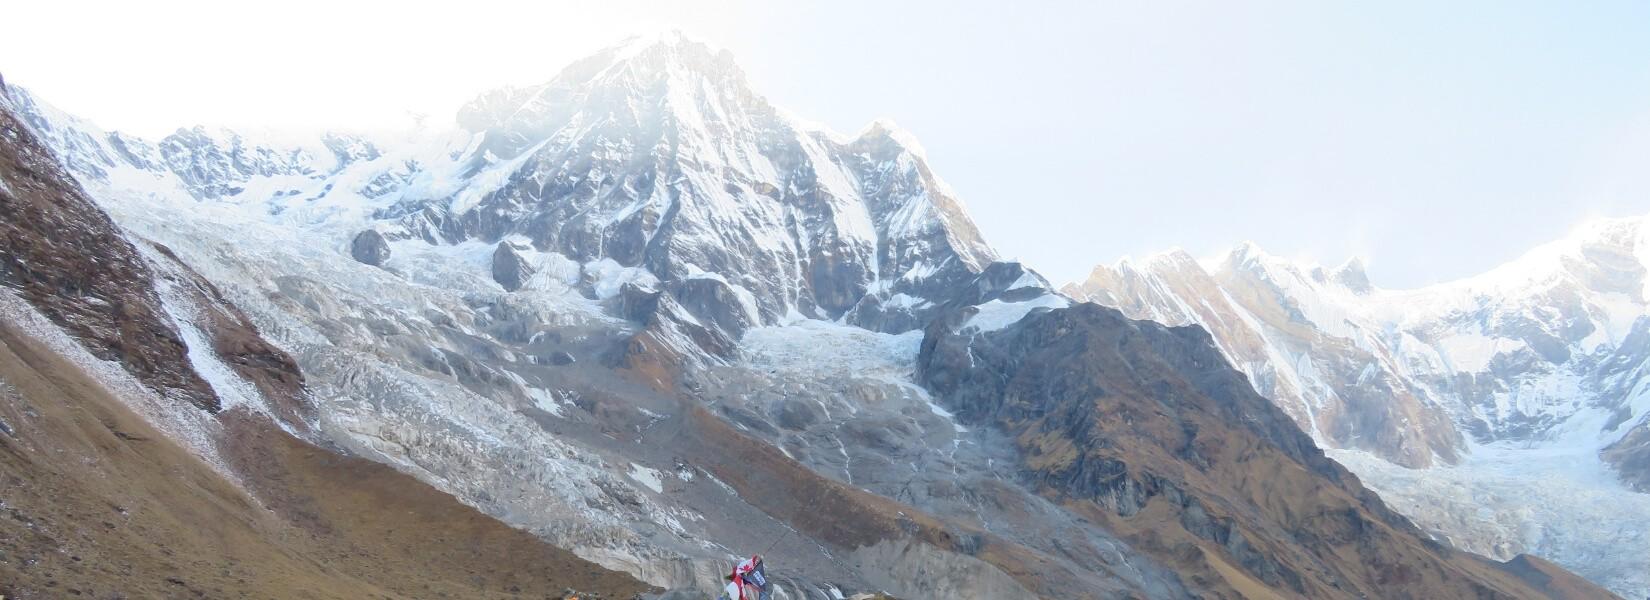 Trek Annapurna Nepal